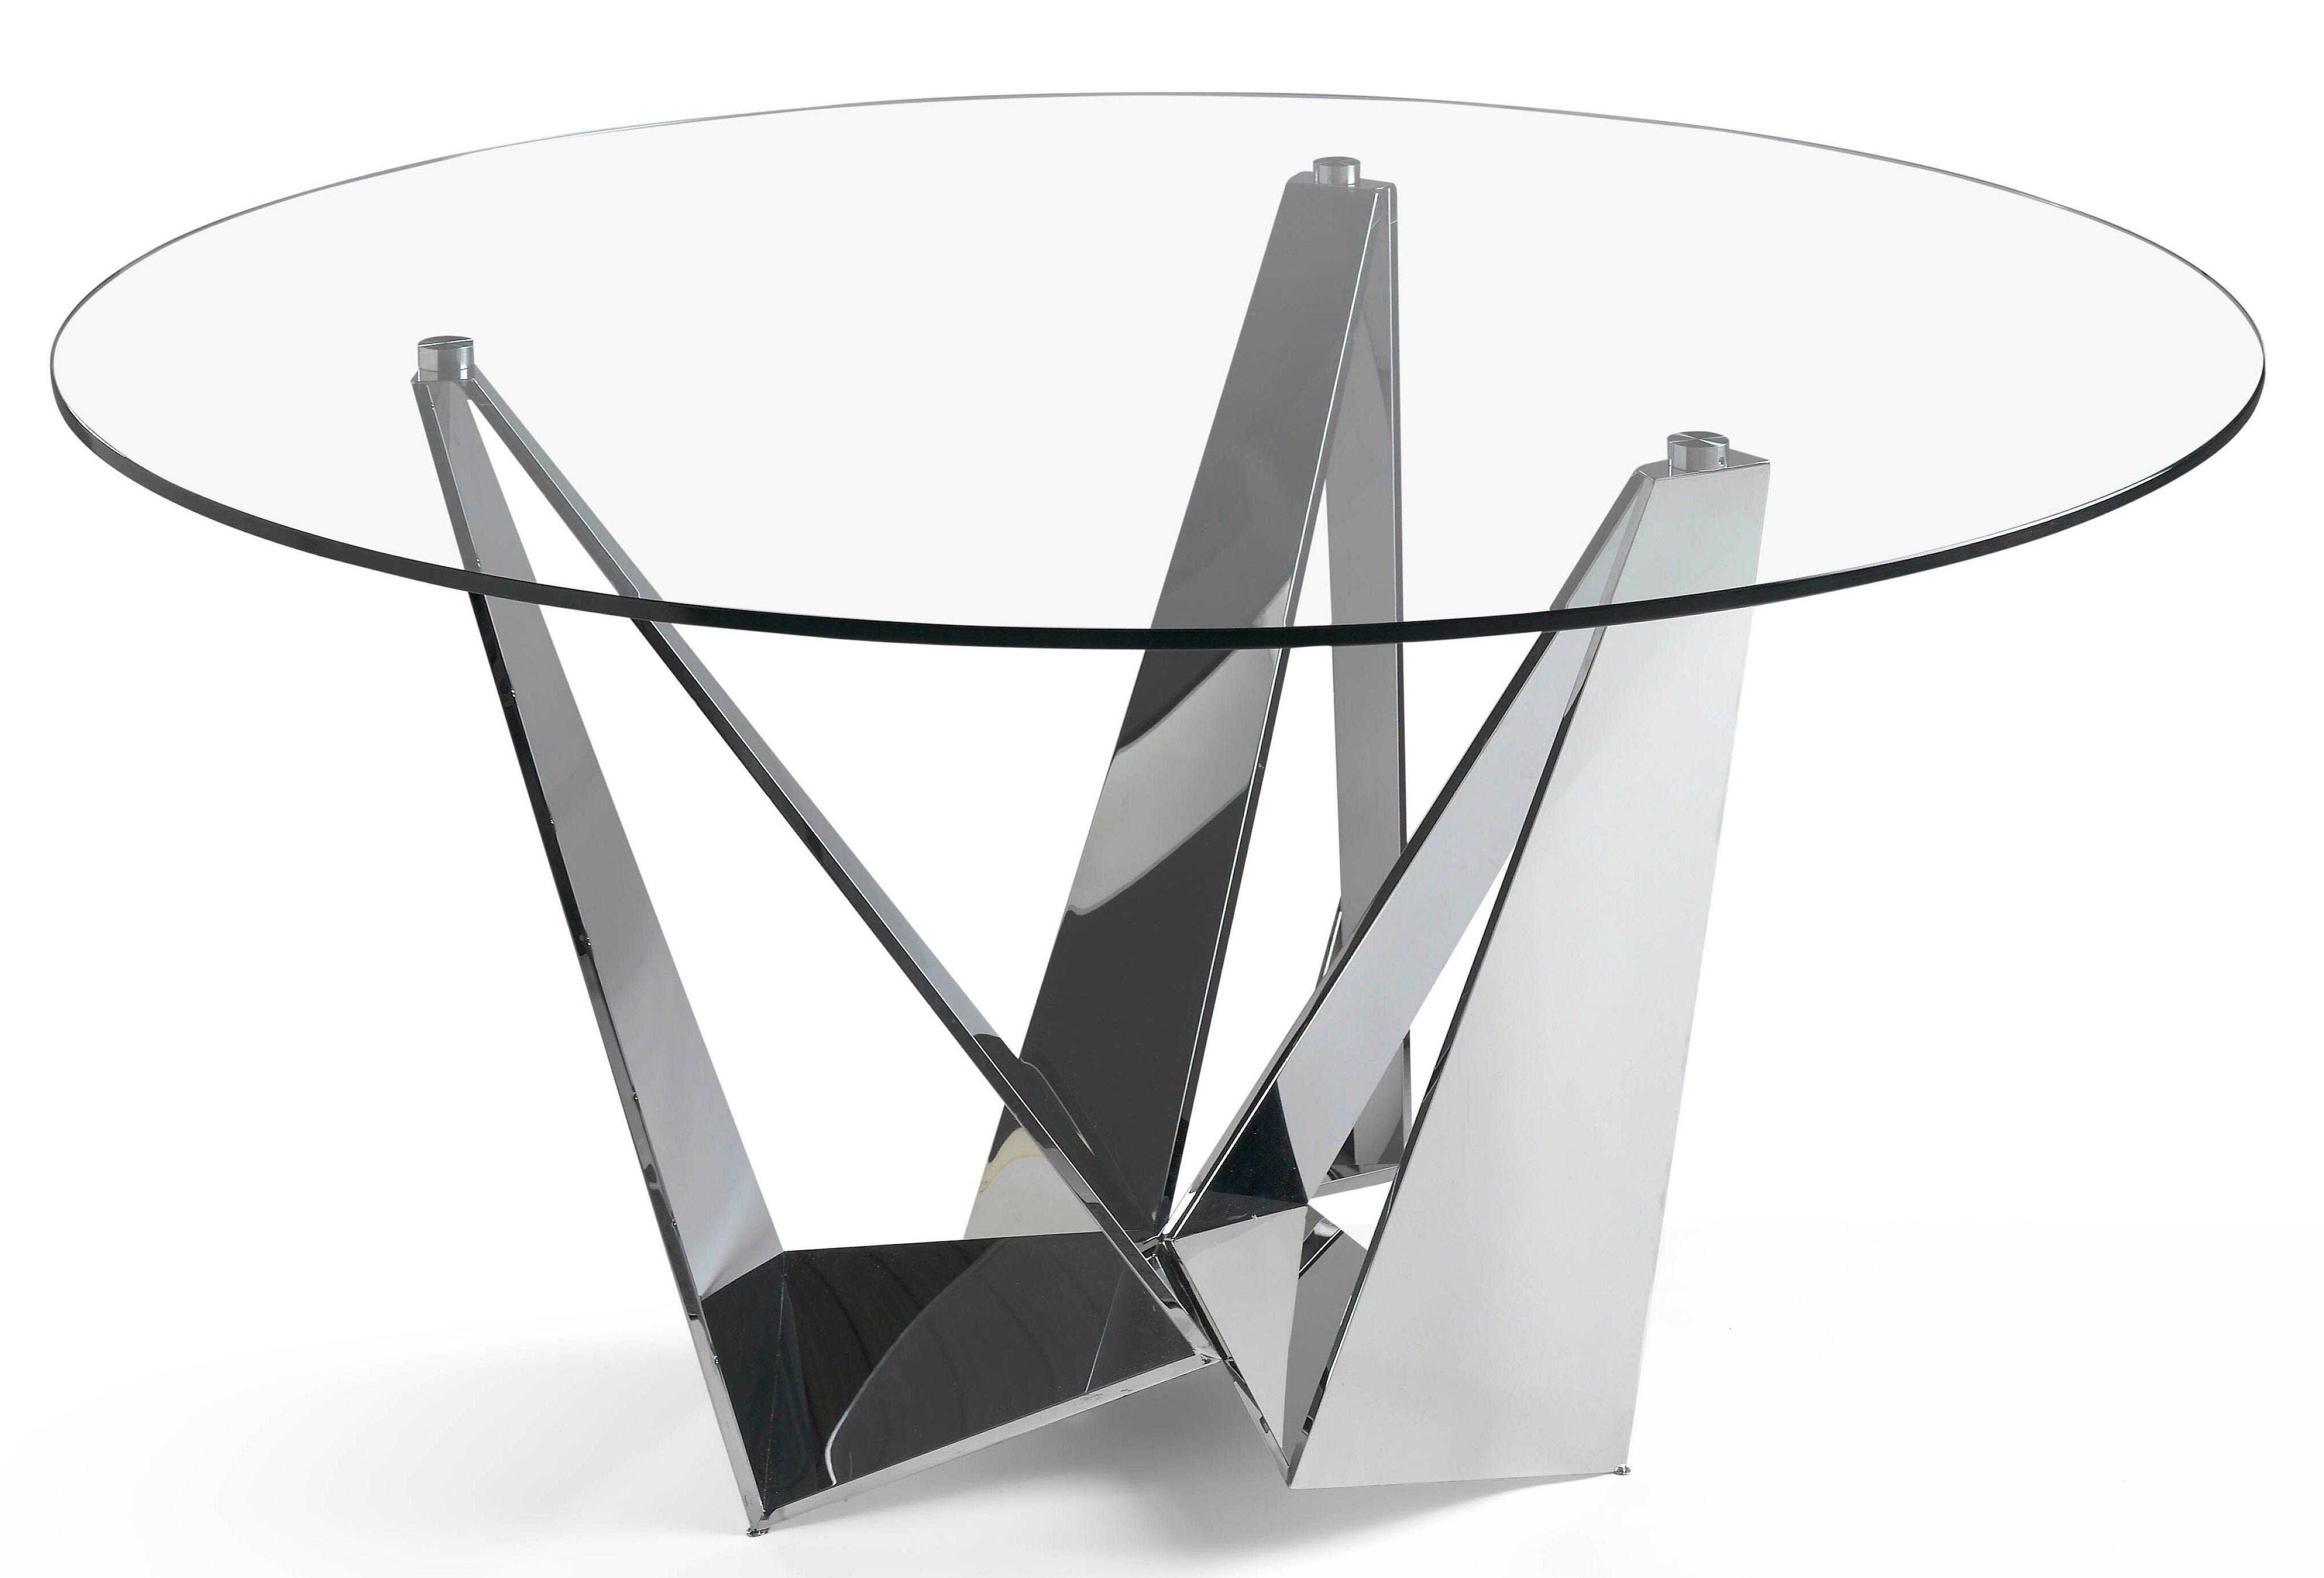 table ronde acier inoxydable et verre tremp trypa. Black Bedroom Furniture Sets. Home Design Ideas